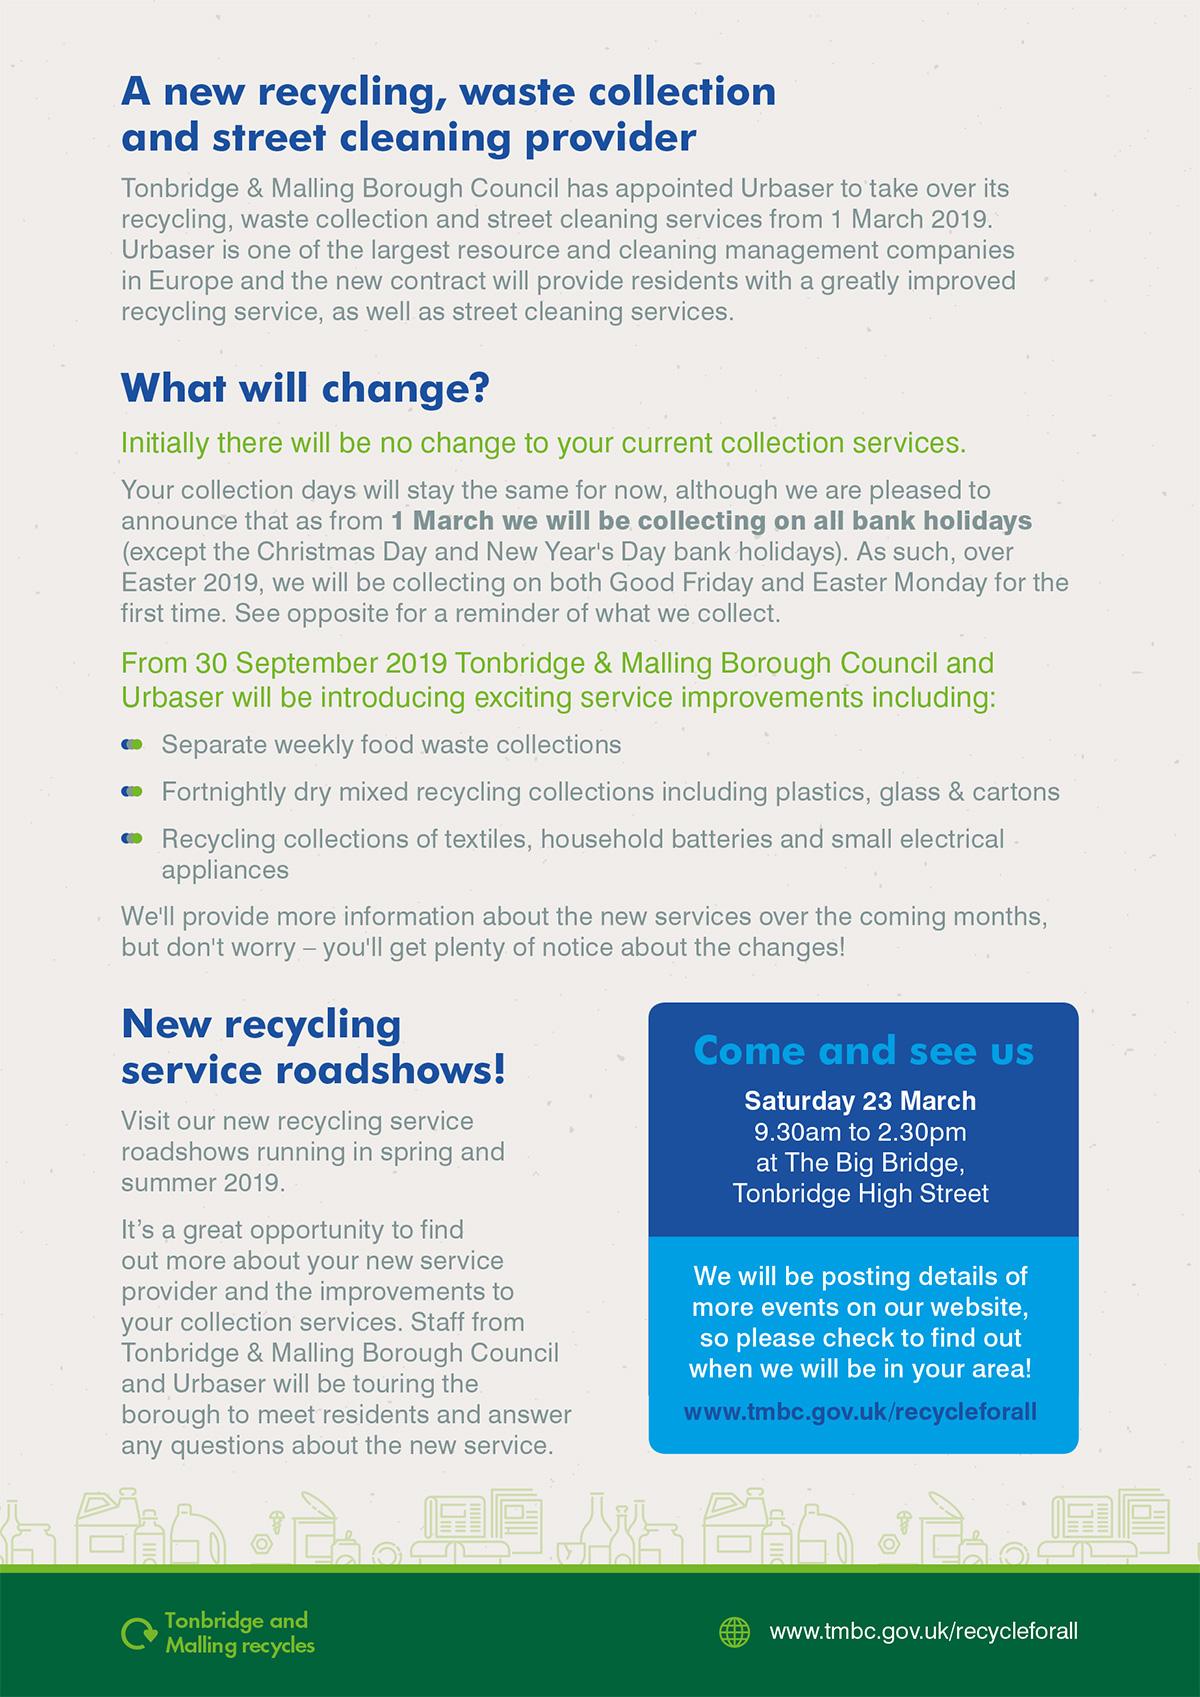 Urbaser Tonbridge Waste Provider - Text version follows images